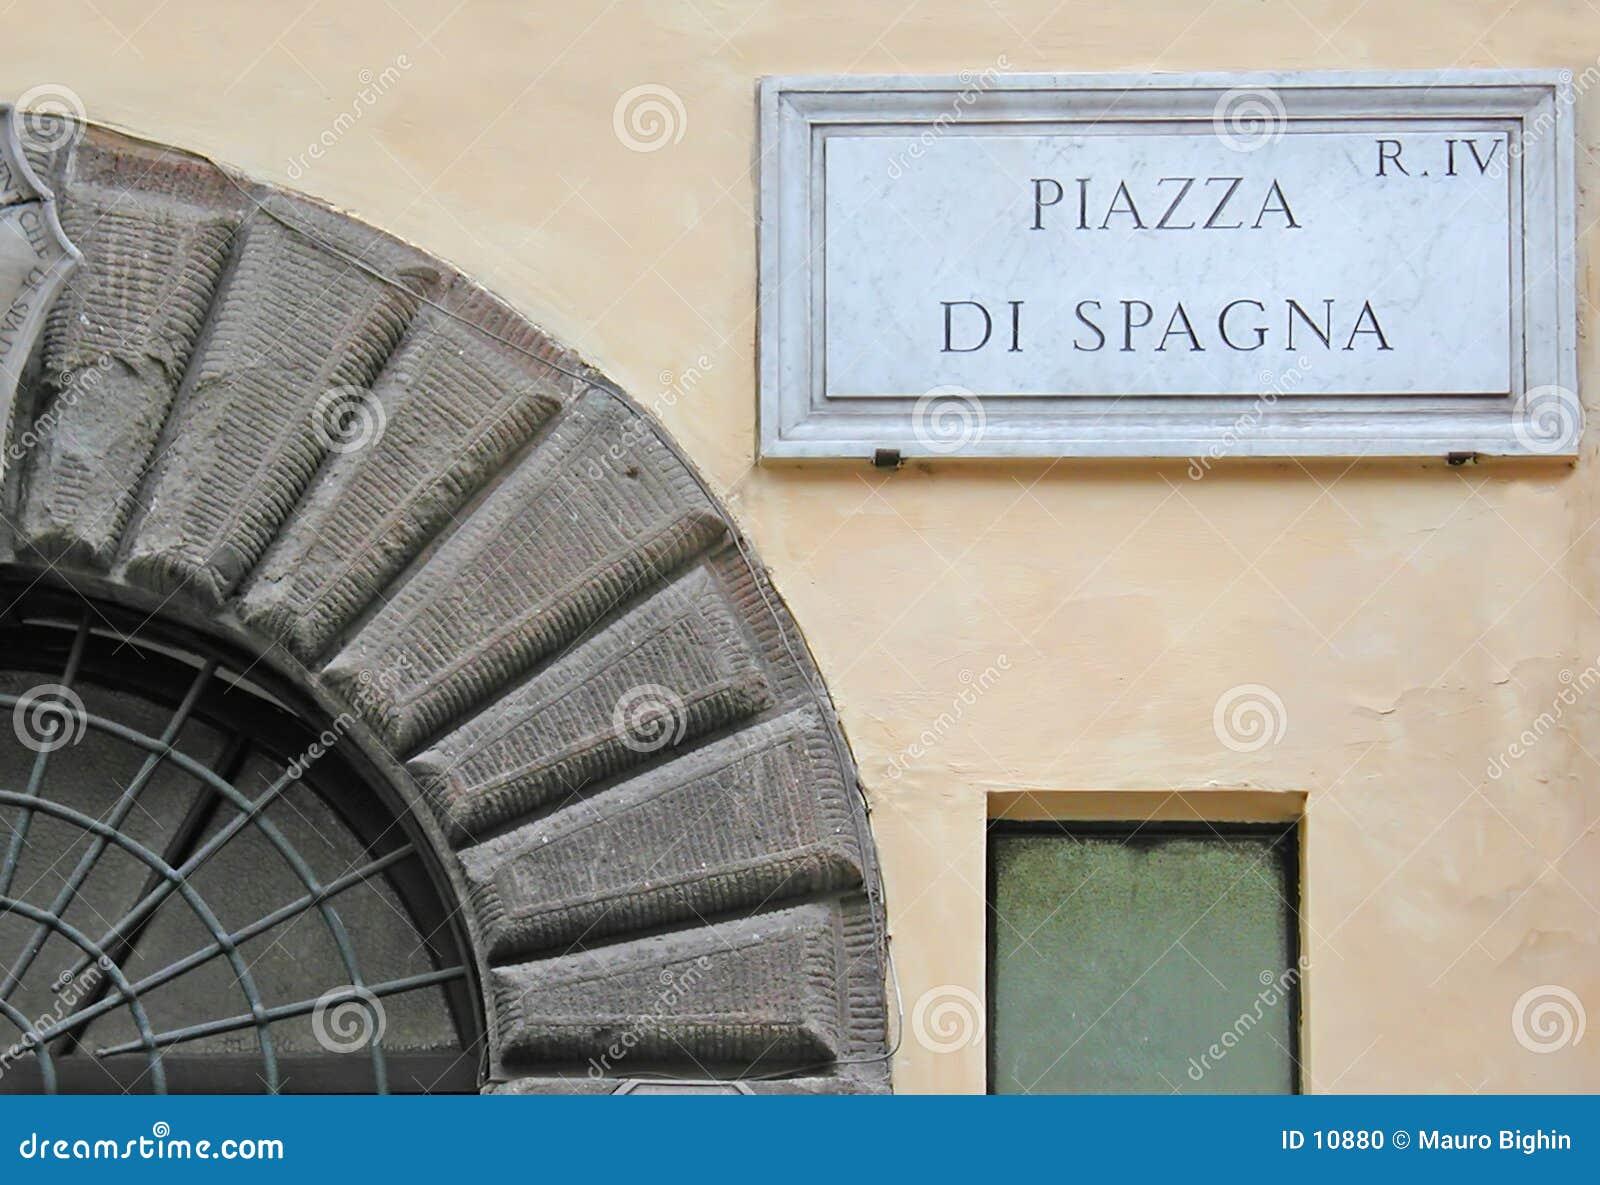 Piazza di Spagna sign - Rome - Italy